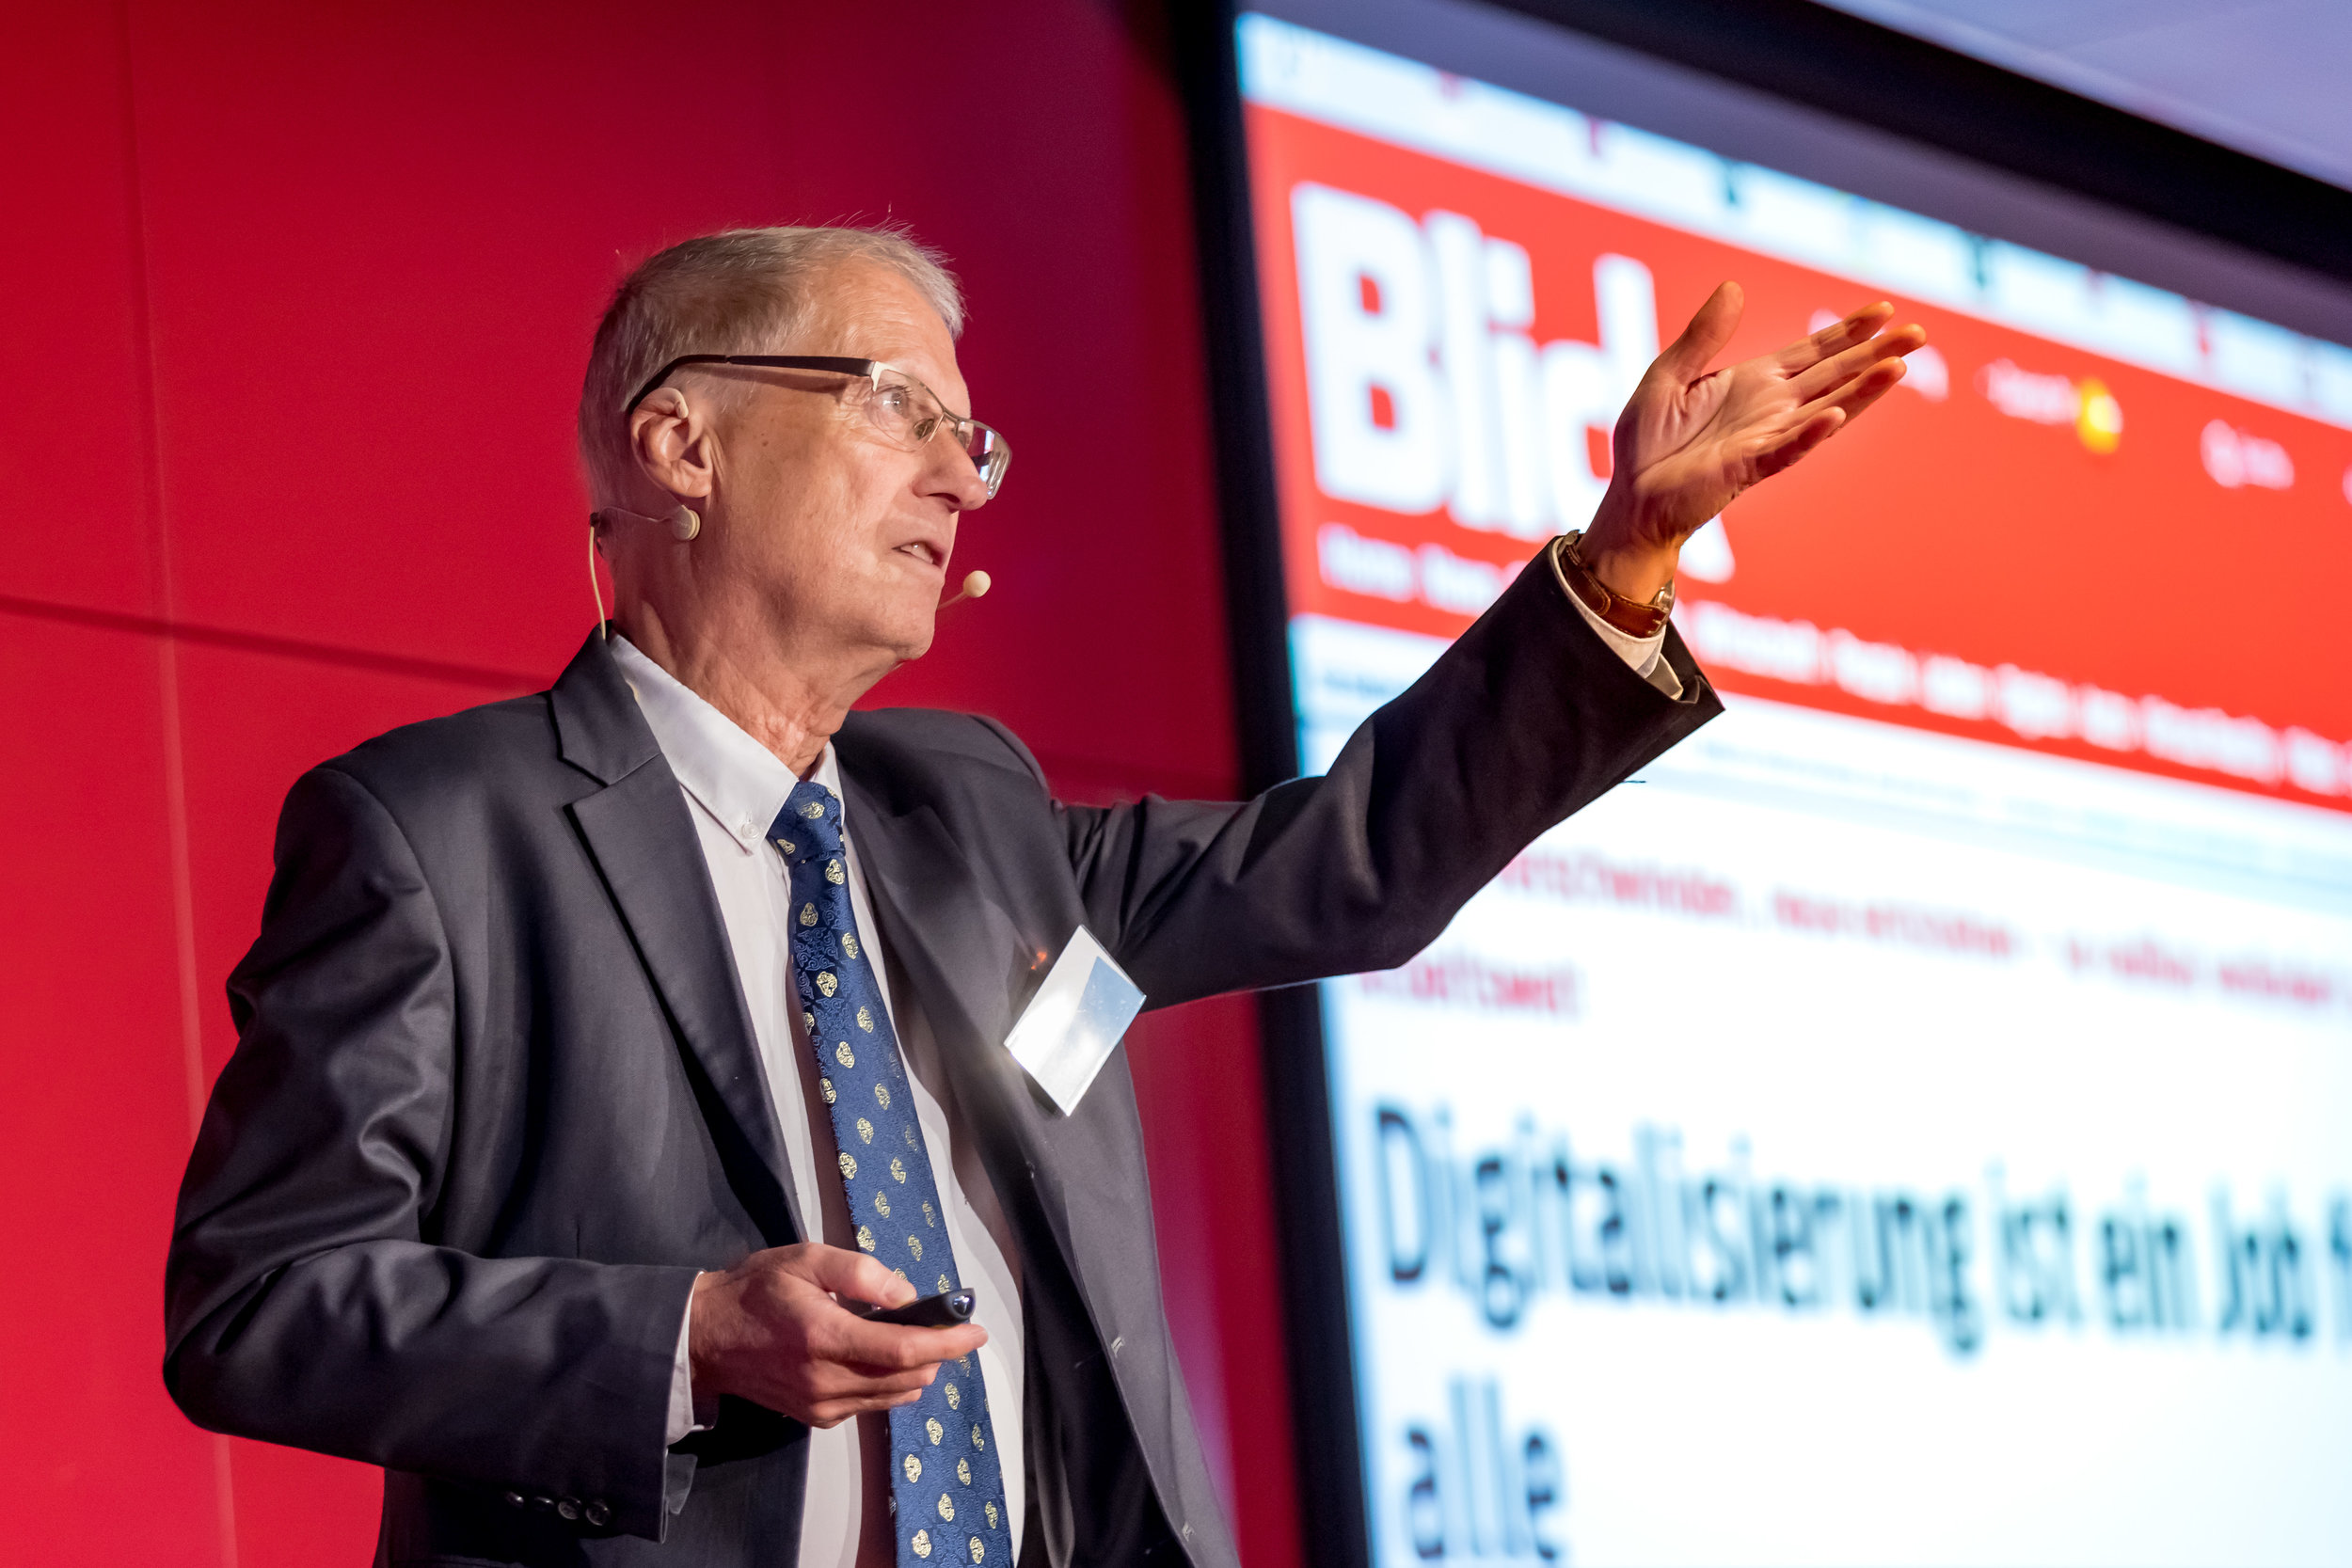 Prof. Dr. Rolf Pfeifer